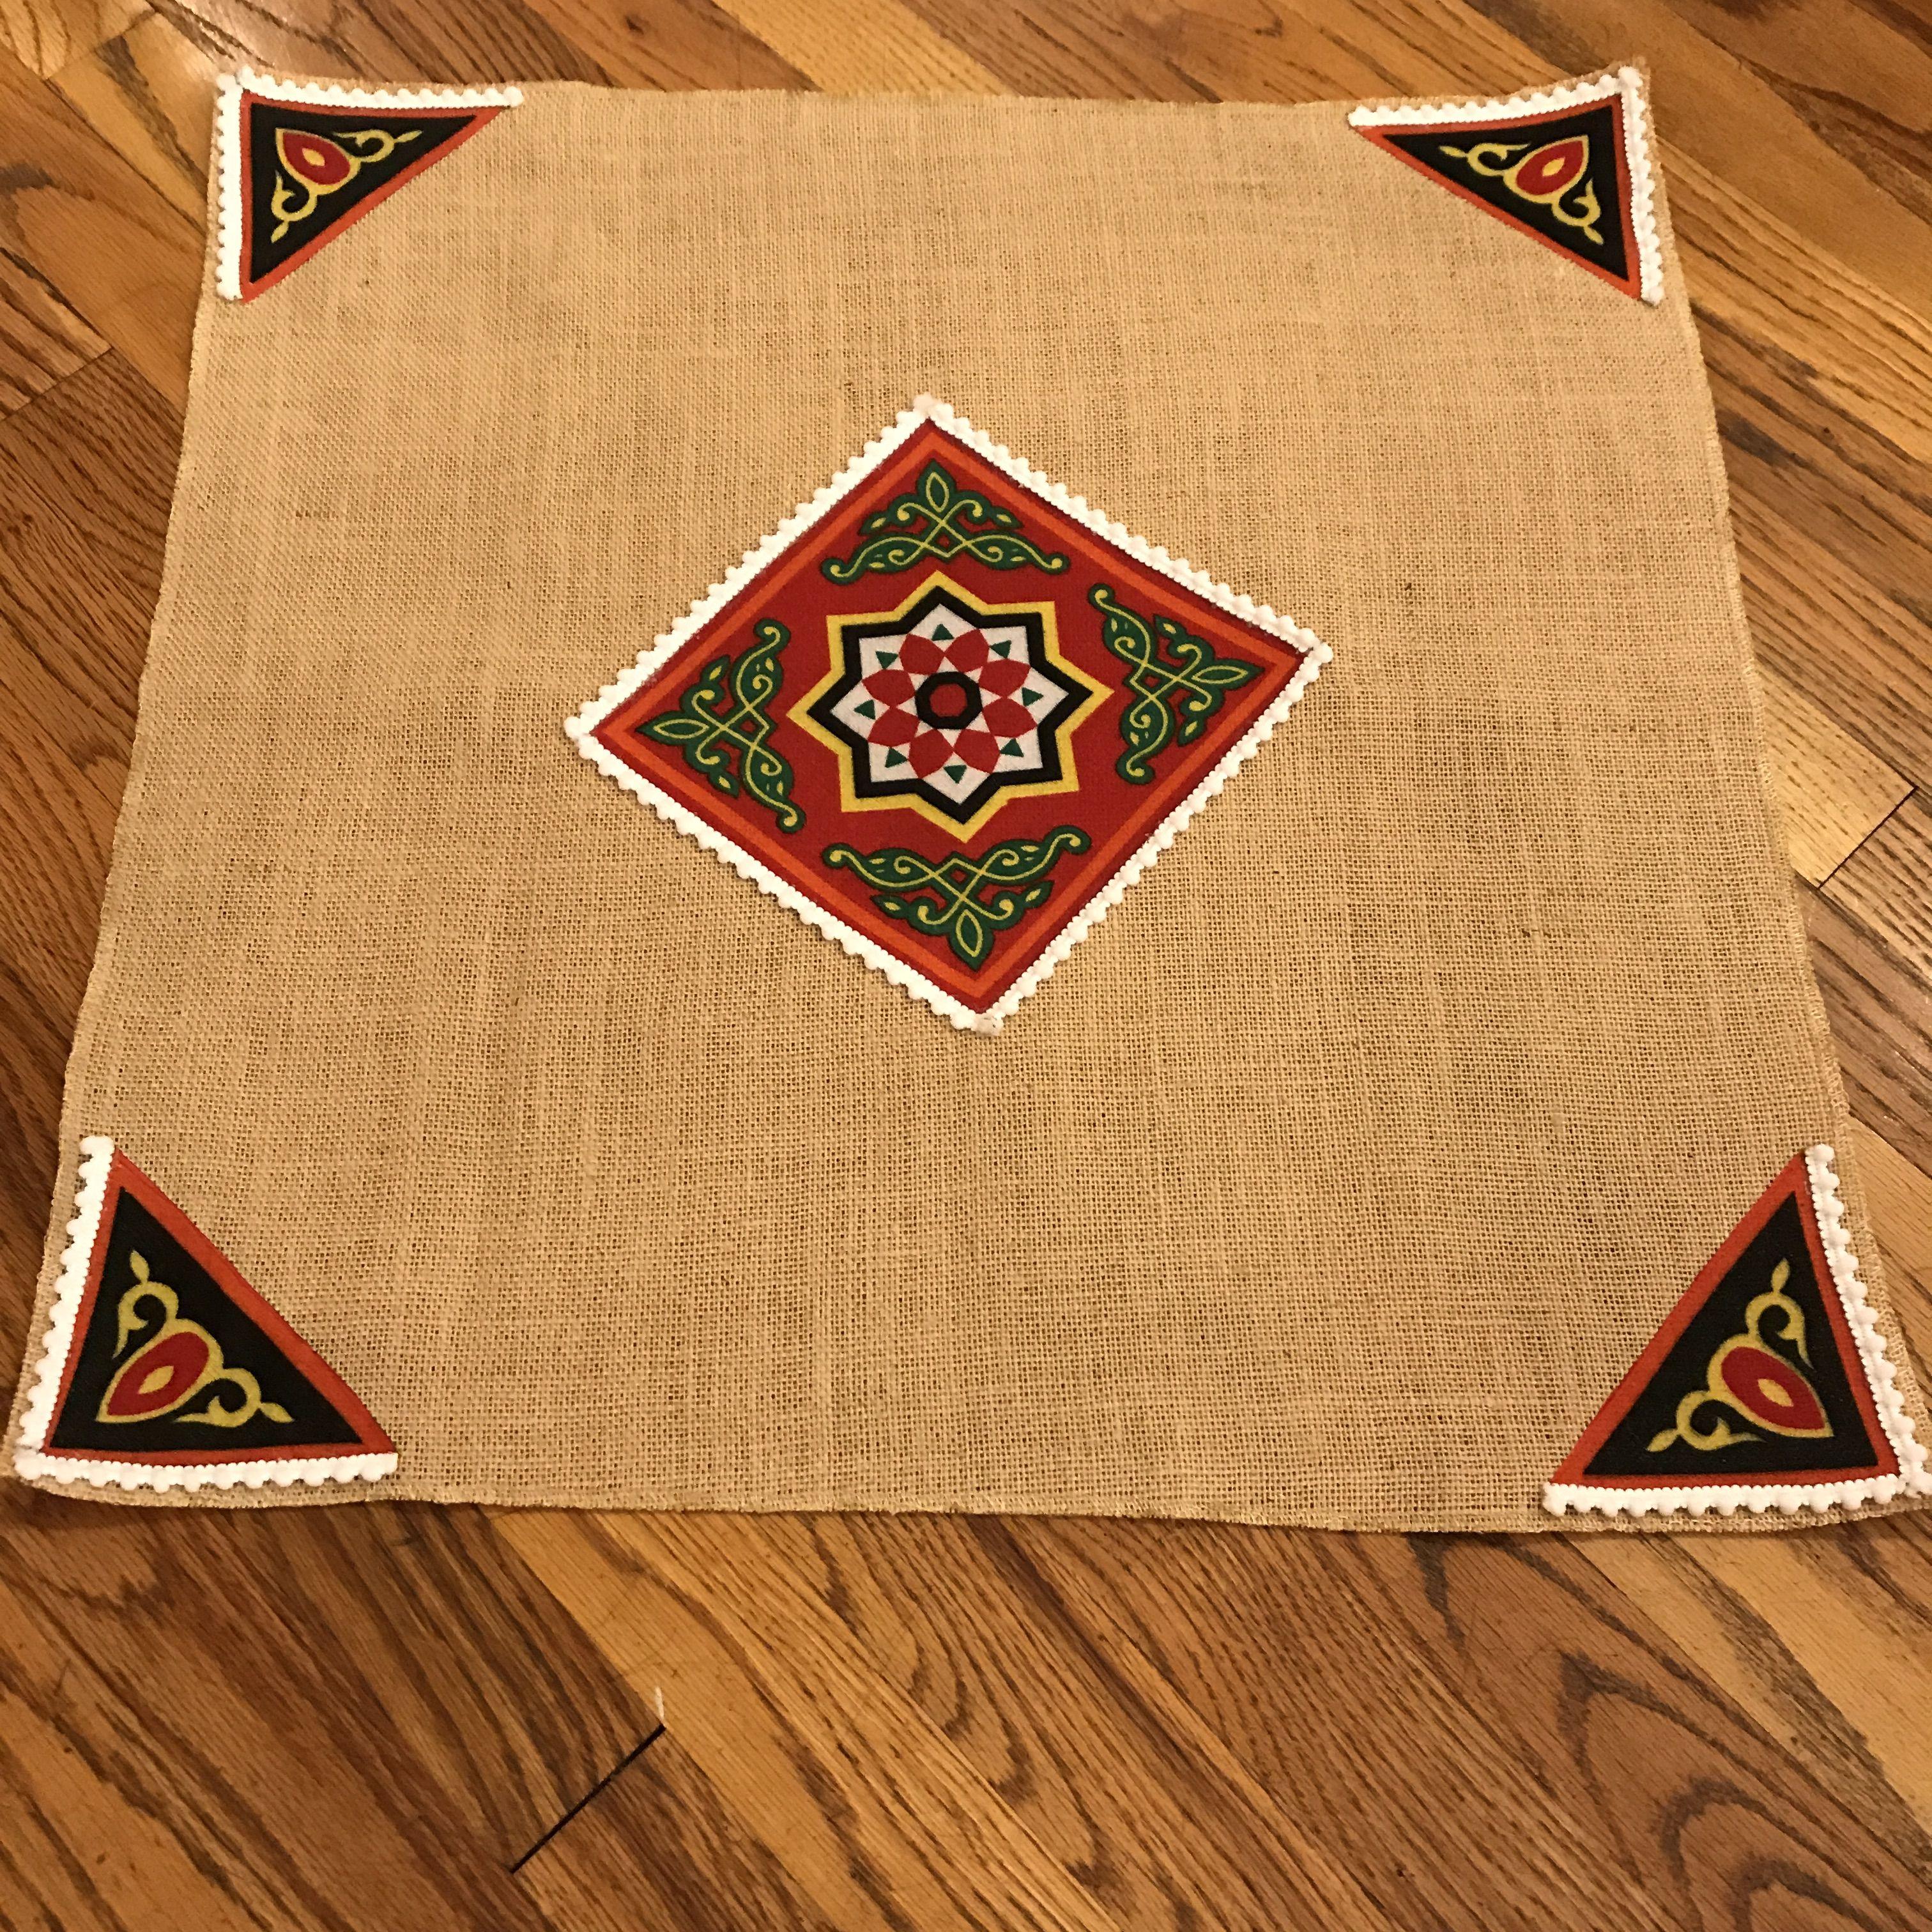 Ramadan Small Table Cloth For Coffee Tables Made From Burlap And Decorated With Traditional Khayamia Fabr Ramadan Crafts Ramadan Decorations Ramadan Activities